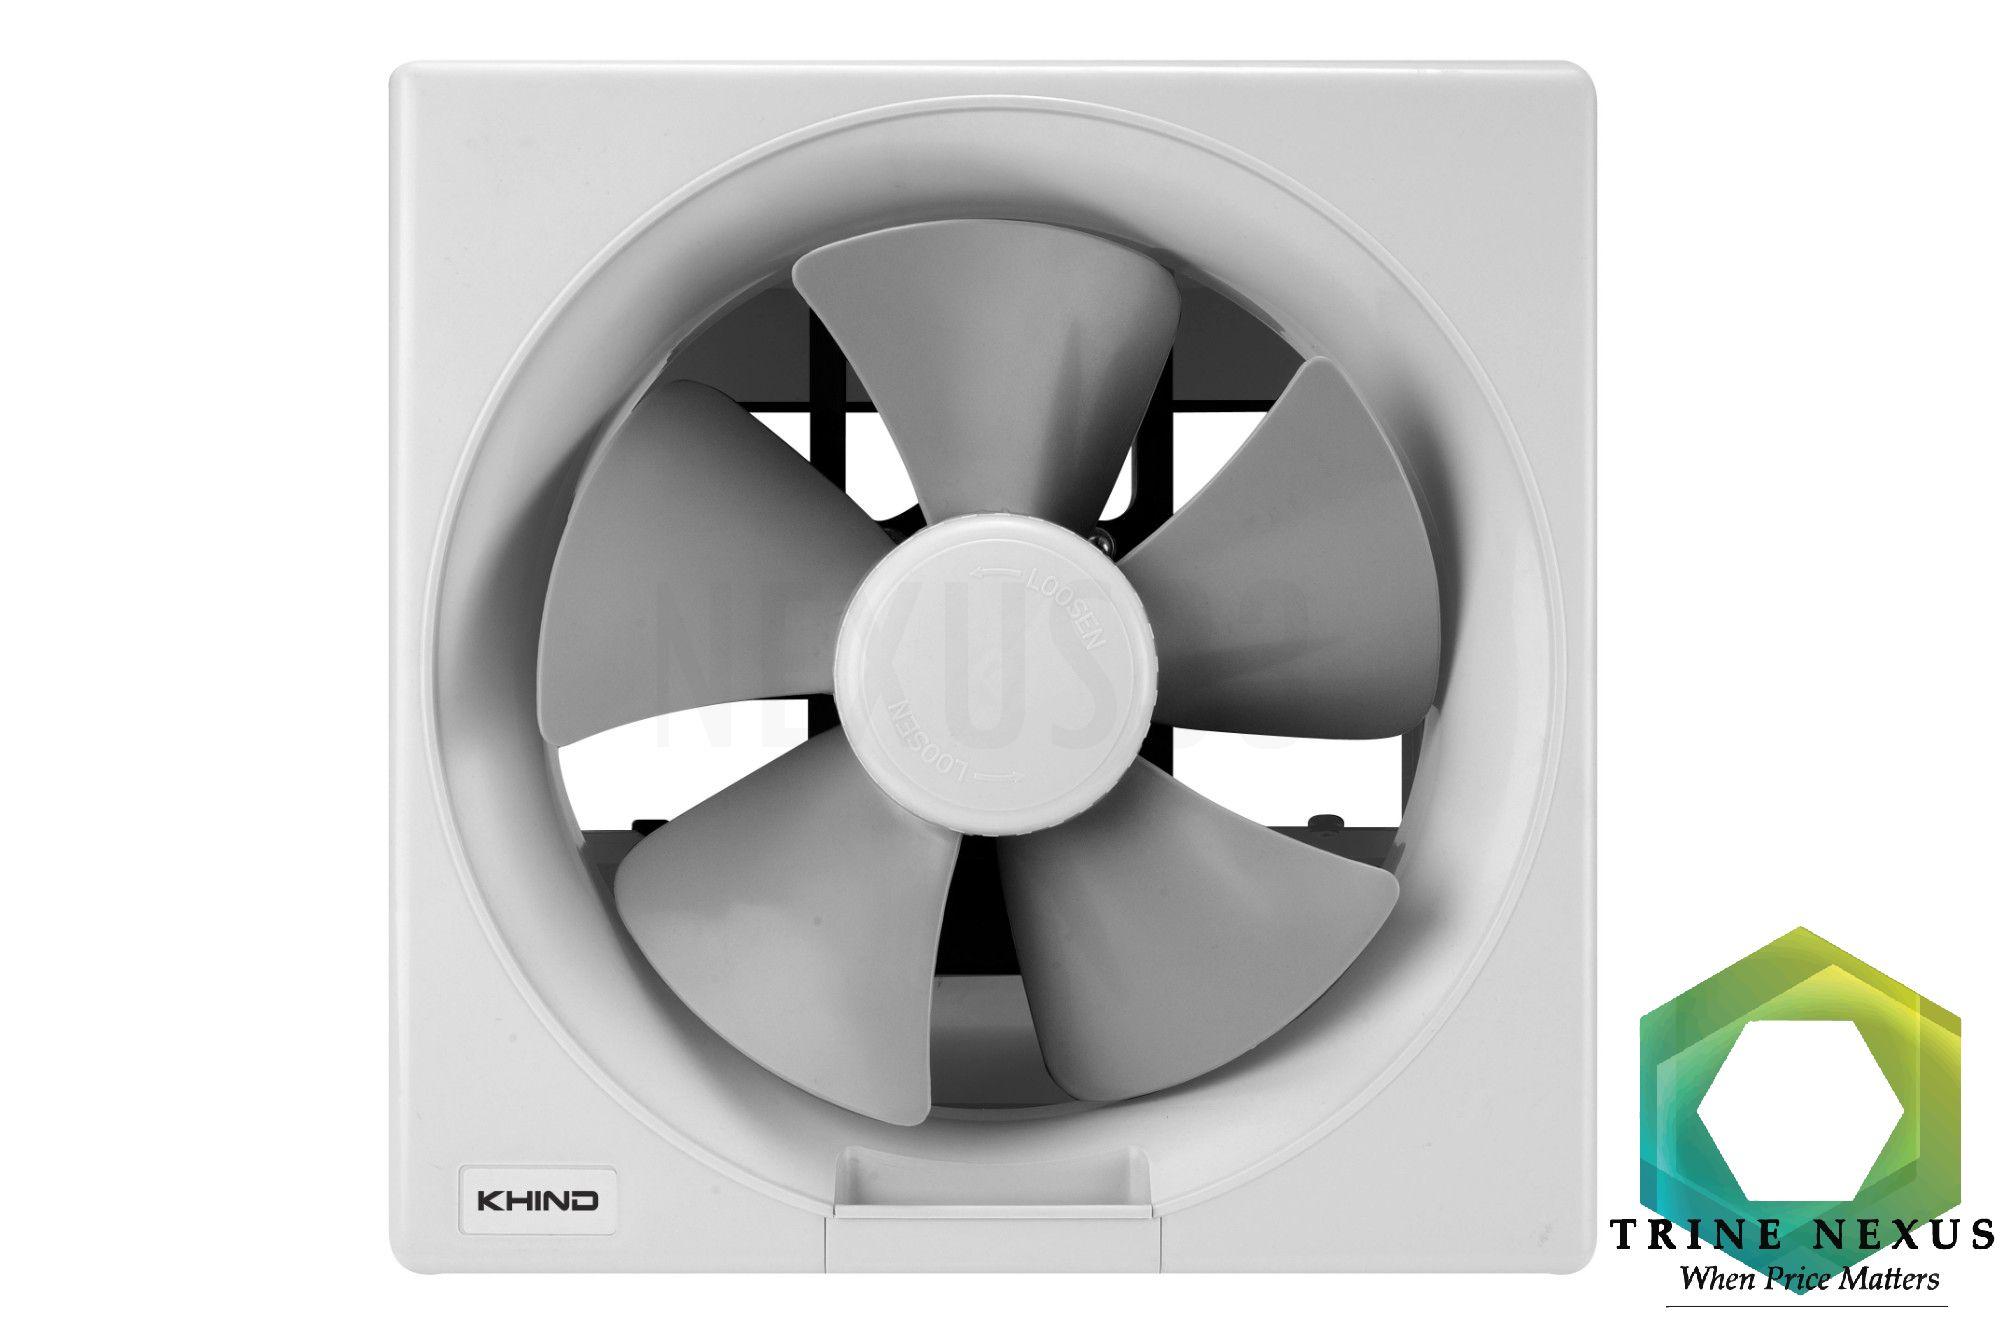 Exhaust Fan Sale Shop line for Exhaust Fan at ez #2: FksNclAdfsfRHLc 6Lm0XS51dvYv